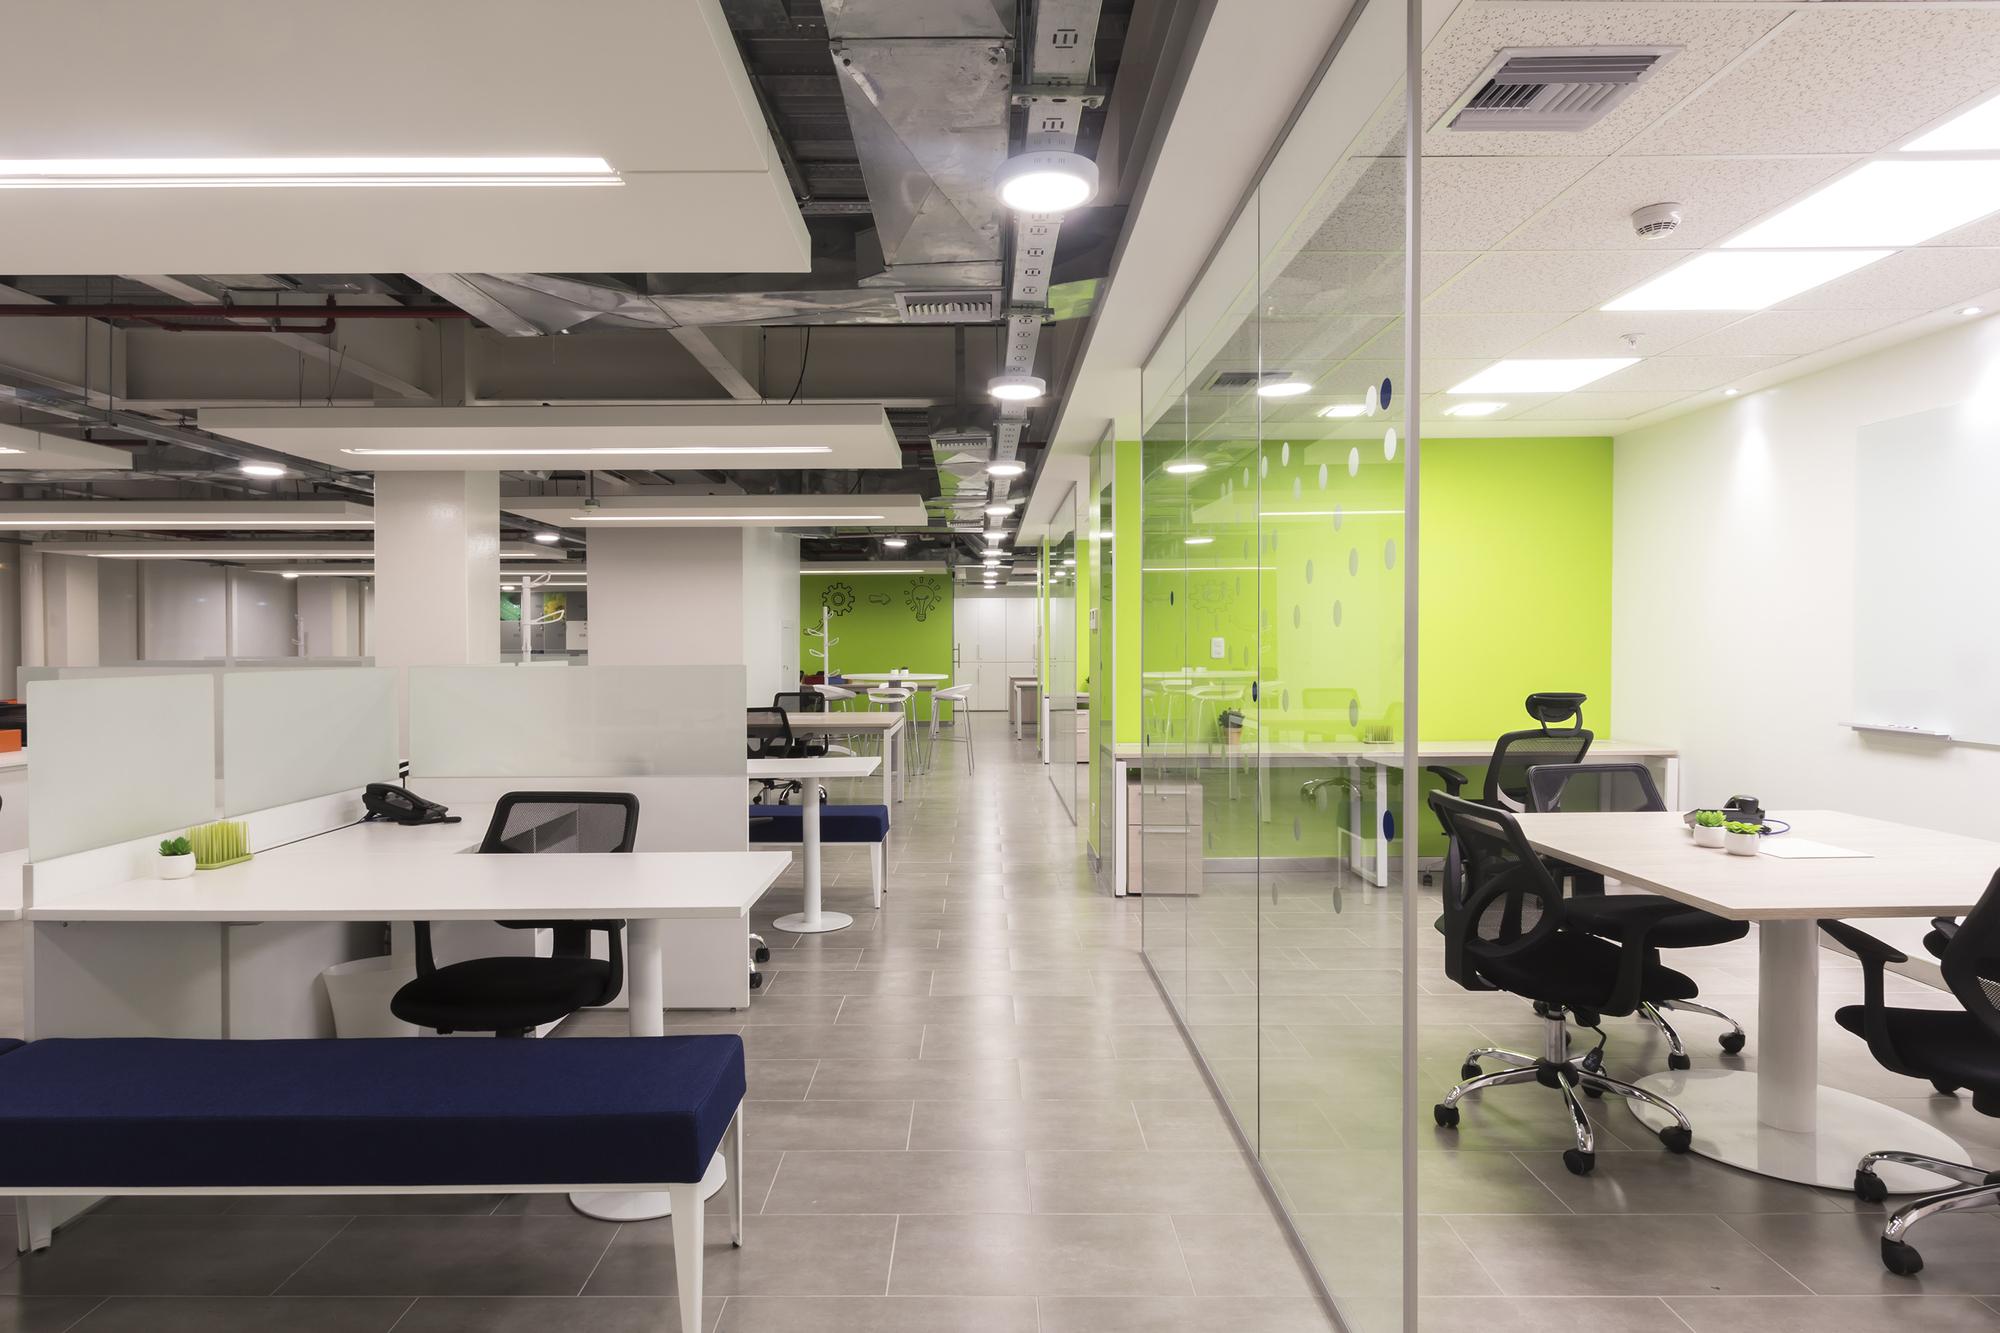 oficinas telef nica contract workplaces plataforma ForOficinas Telefonica